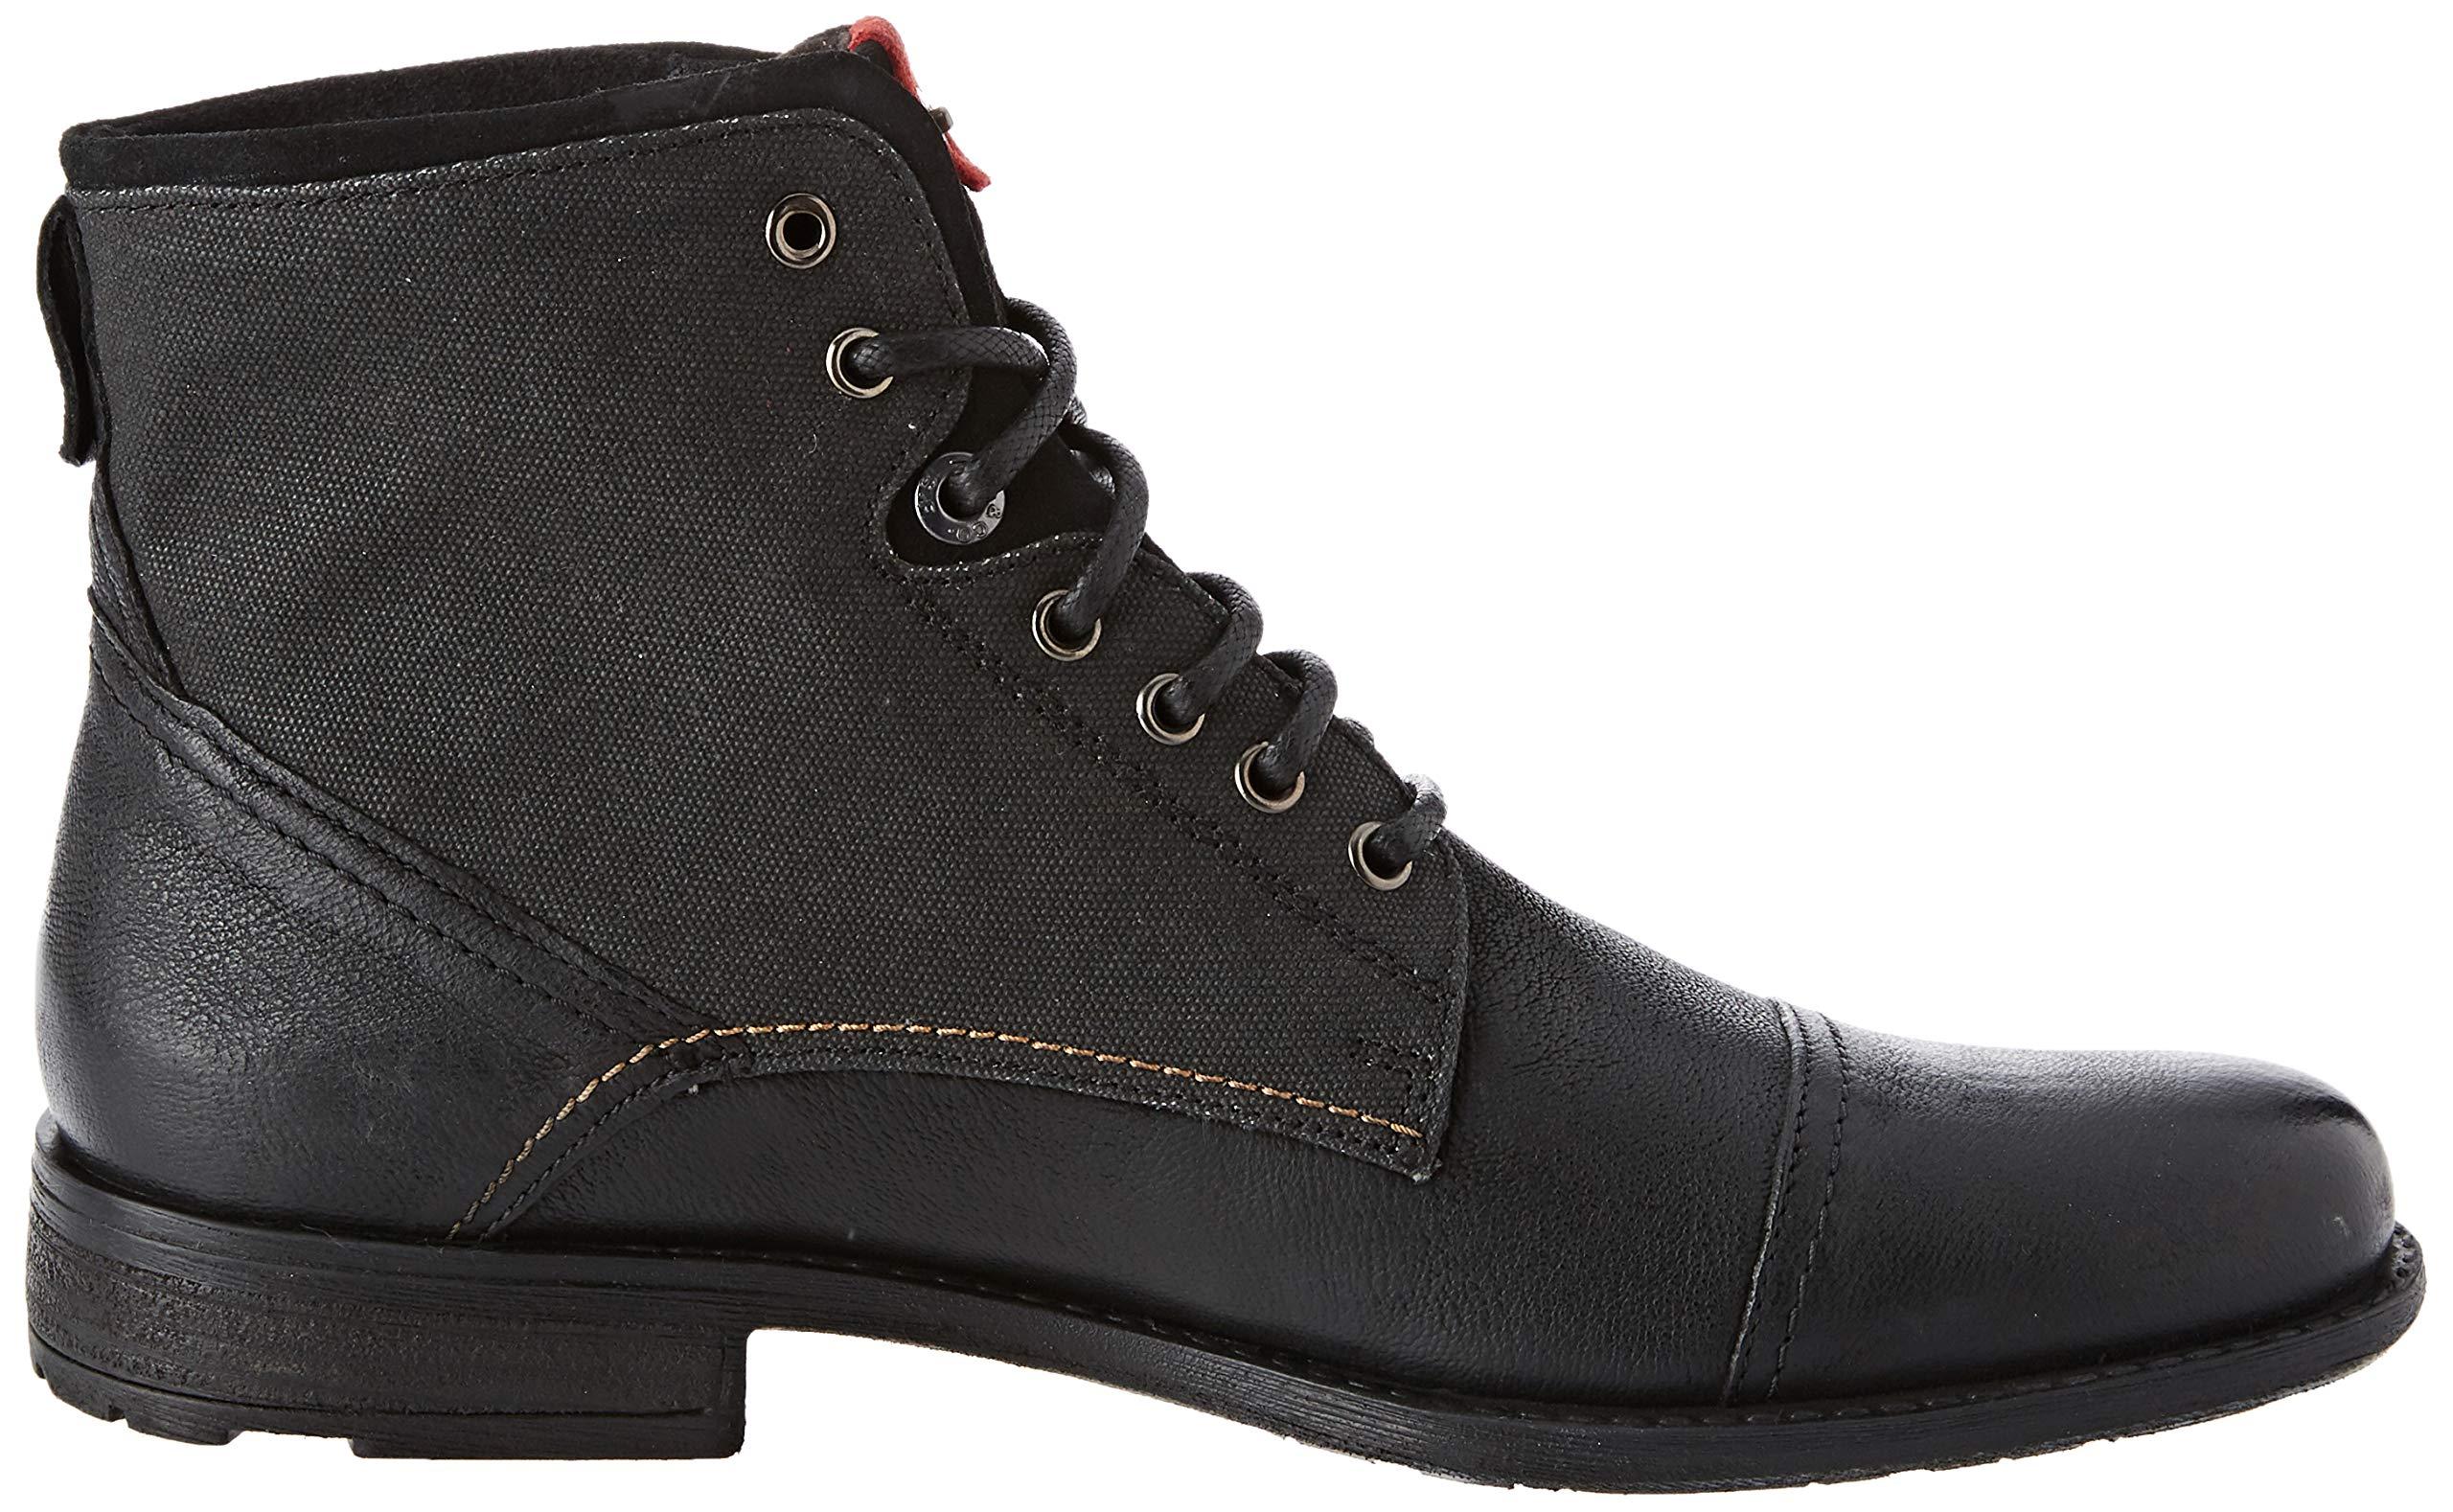 Levi's Men's Fowler Biker Boots 6